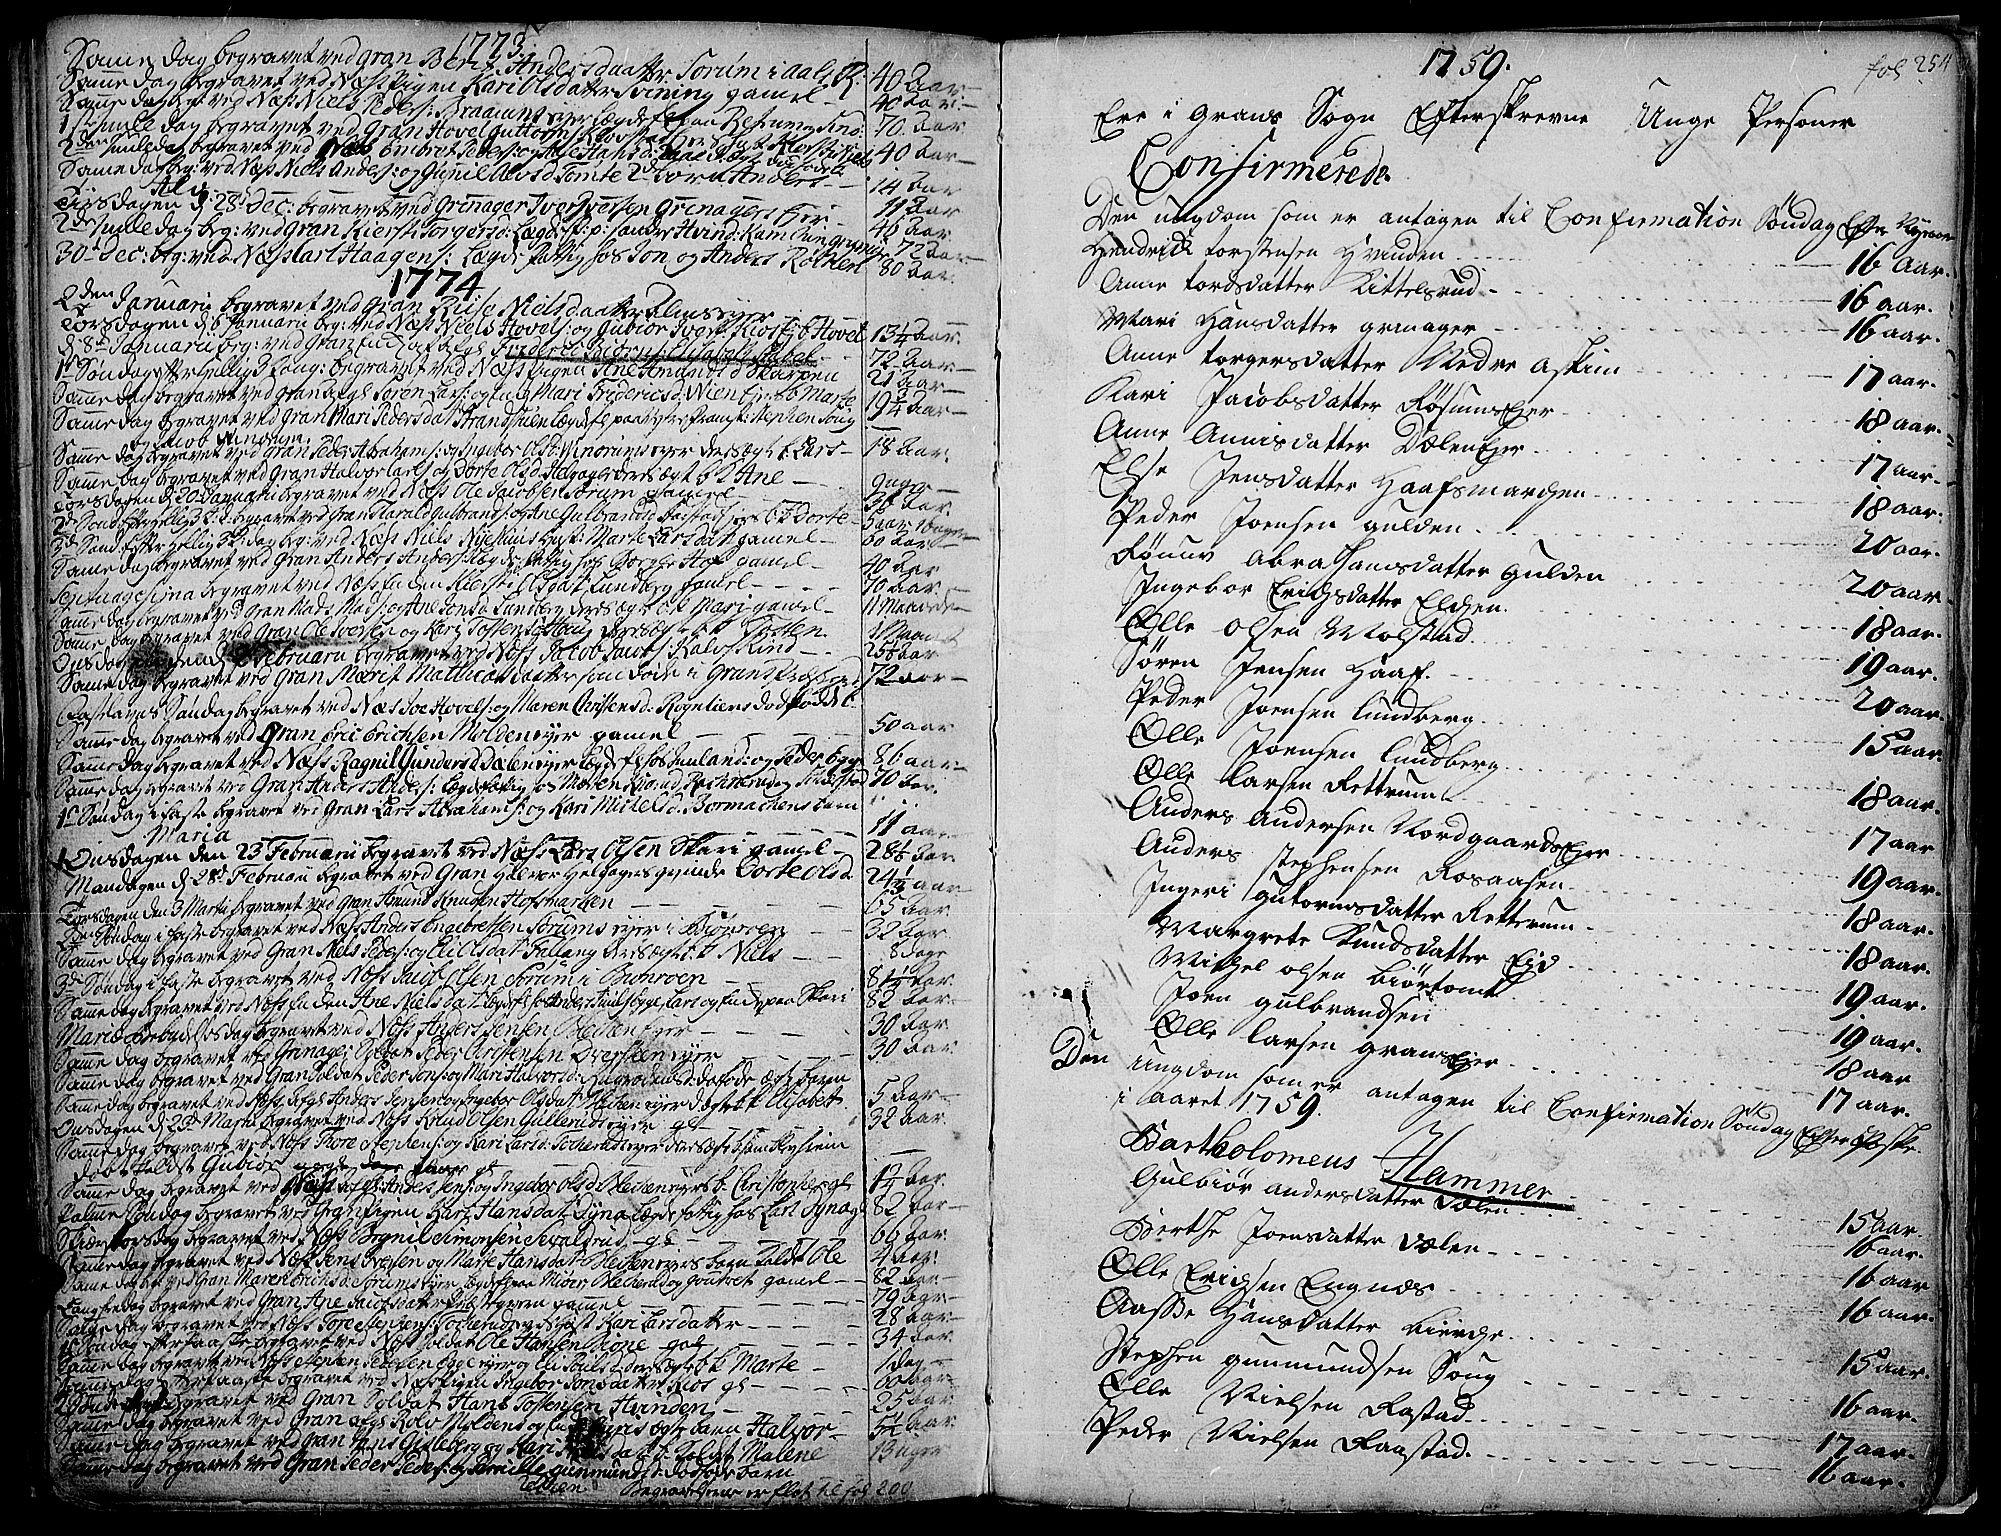 SAH, Gran prestekontor, Ministerialbok nr. 4, 1759-1775, s. 254